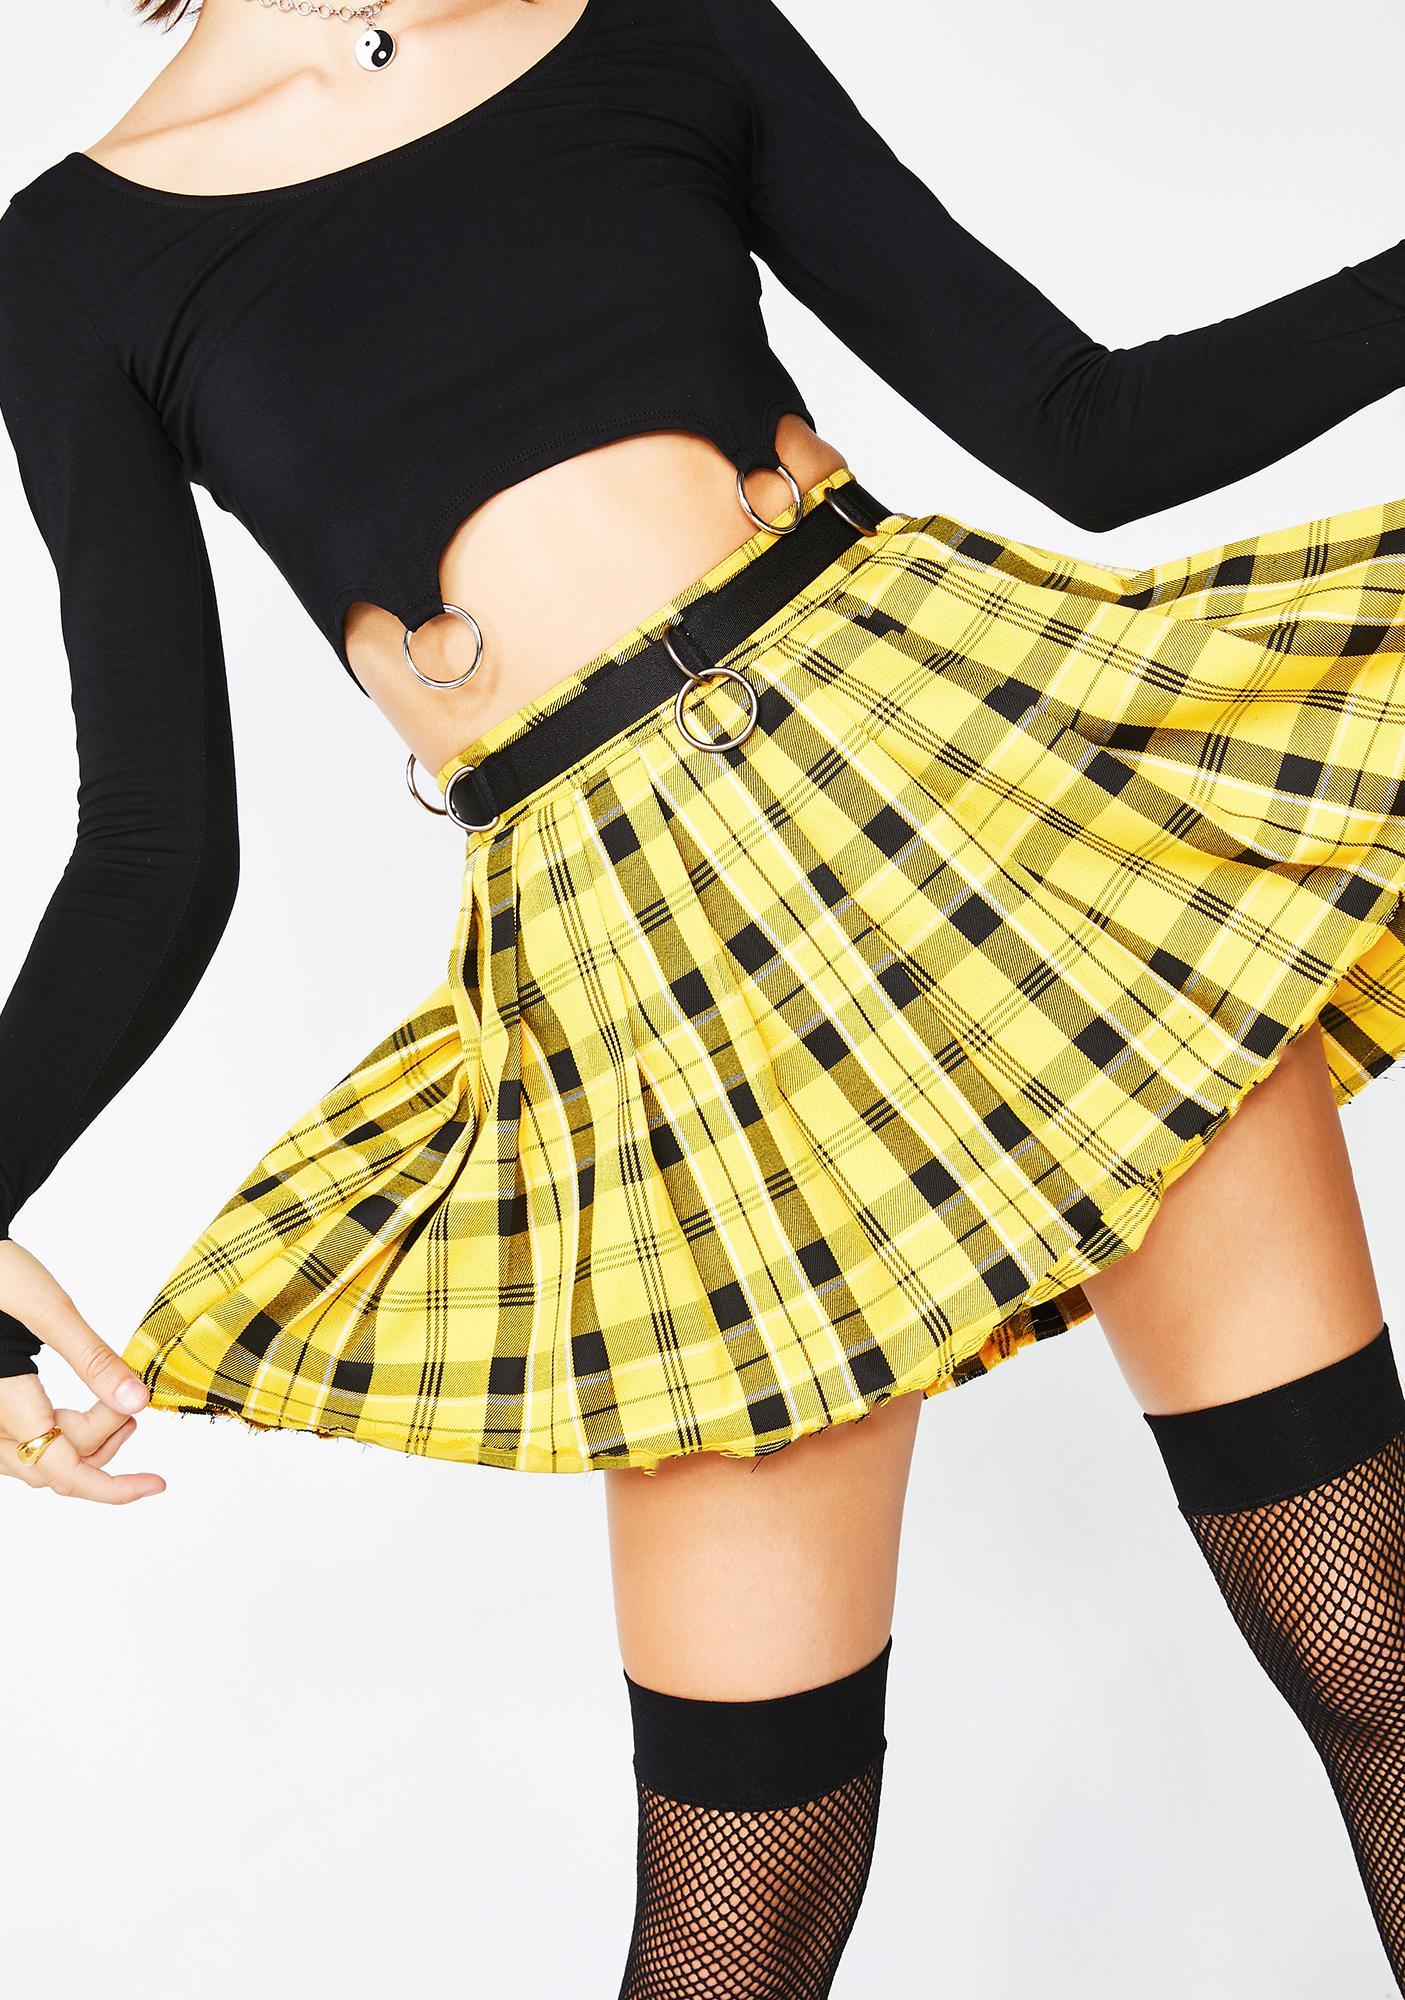 Current Mood Sunny Dress Code Plaid Skirt